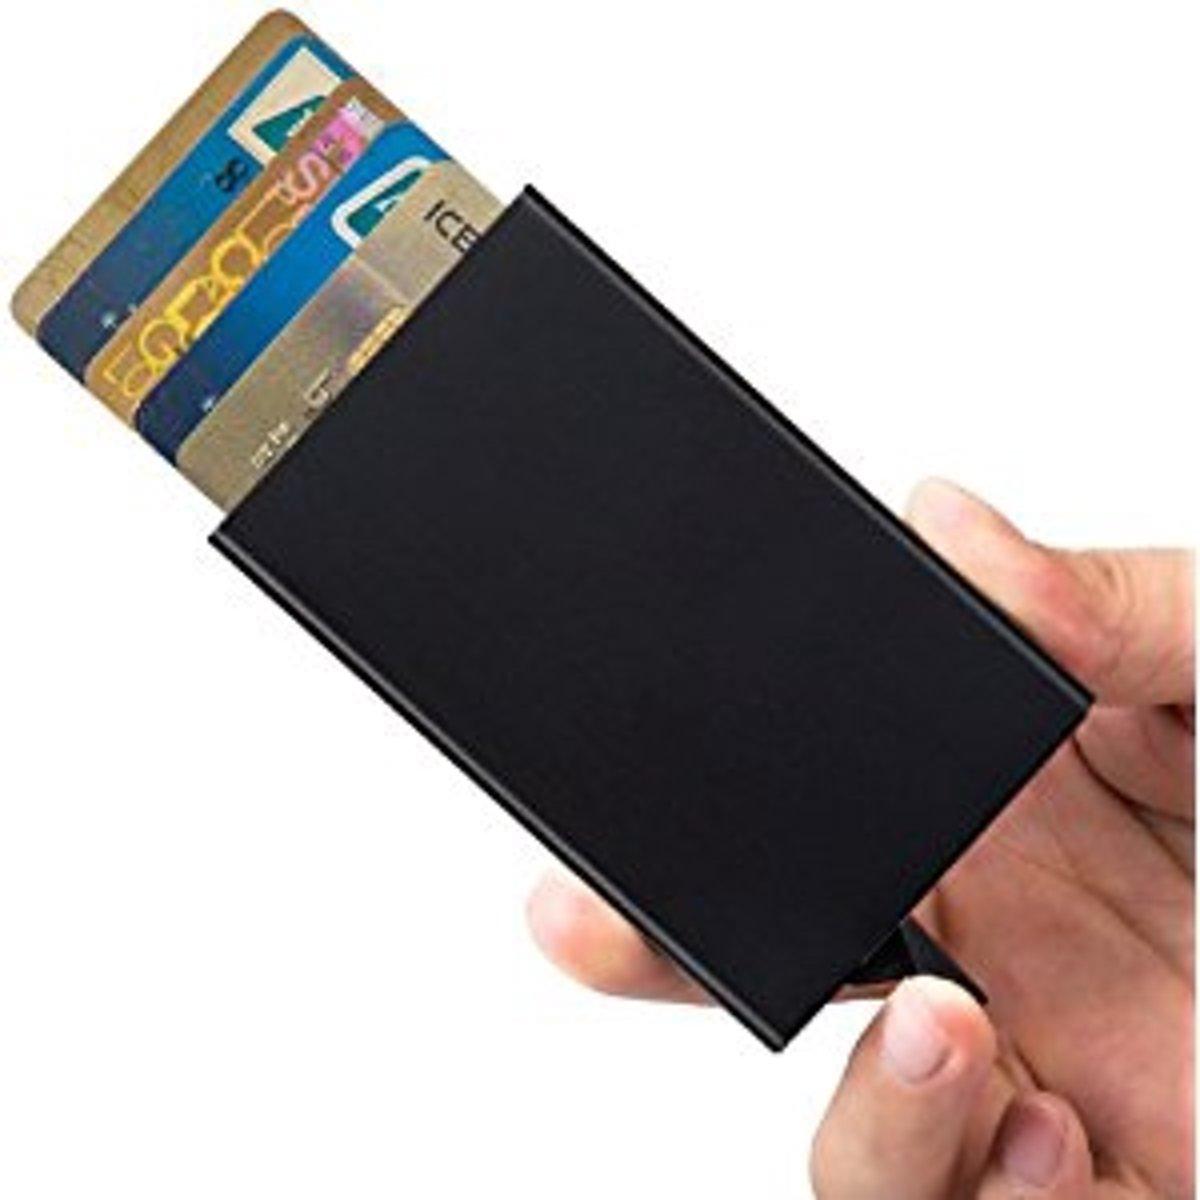 74753b322ff bol.com | Synnect Anti-RFID Aluminium Uitschuifbare Pasjeshouder -  Portemonnee – Cardprotector -.